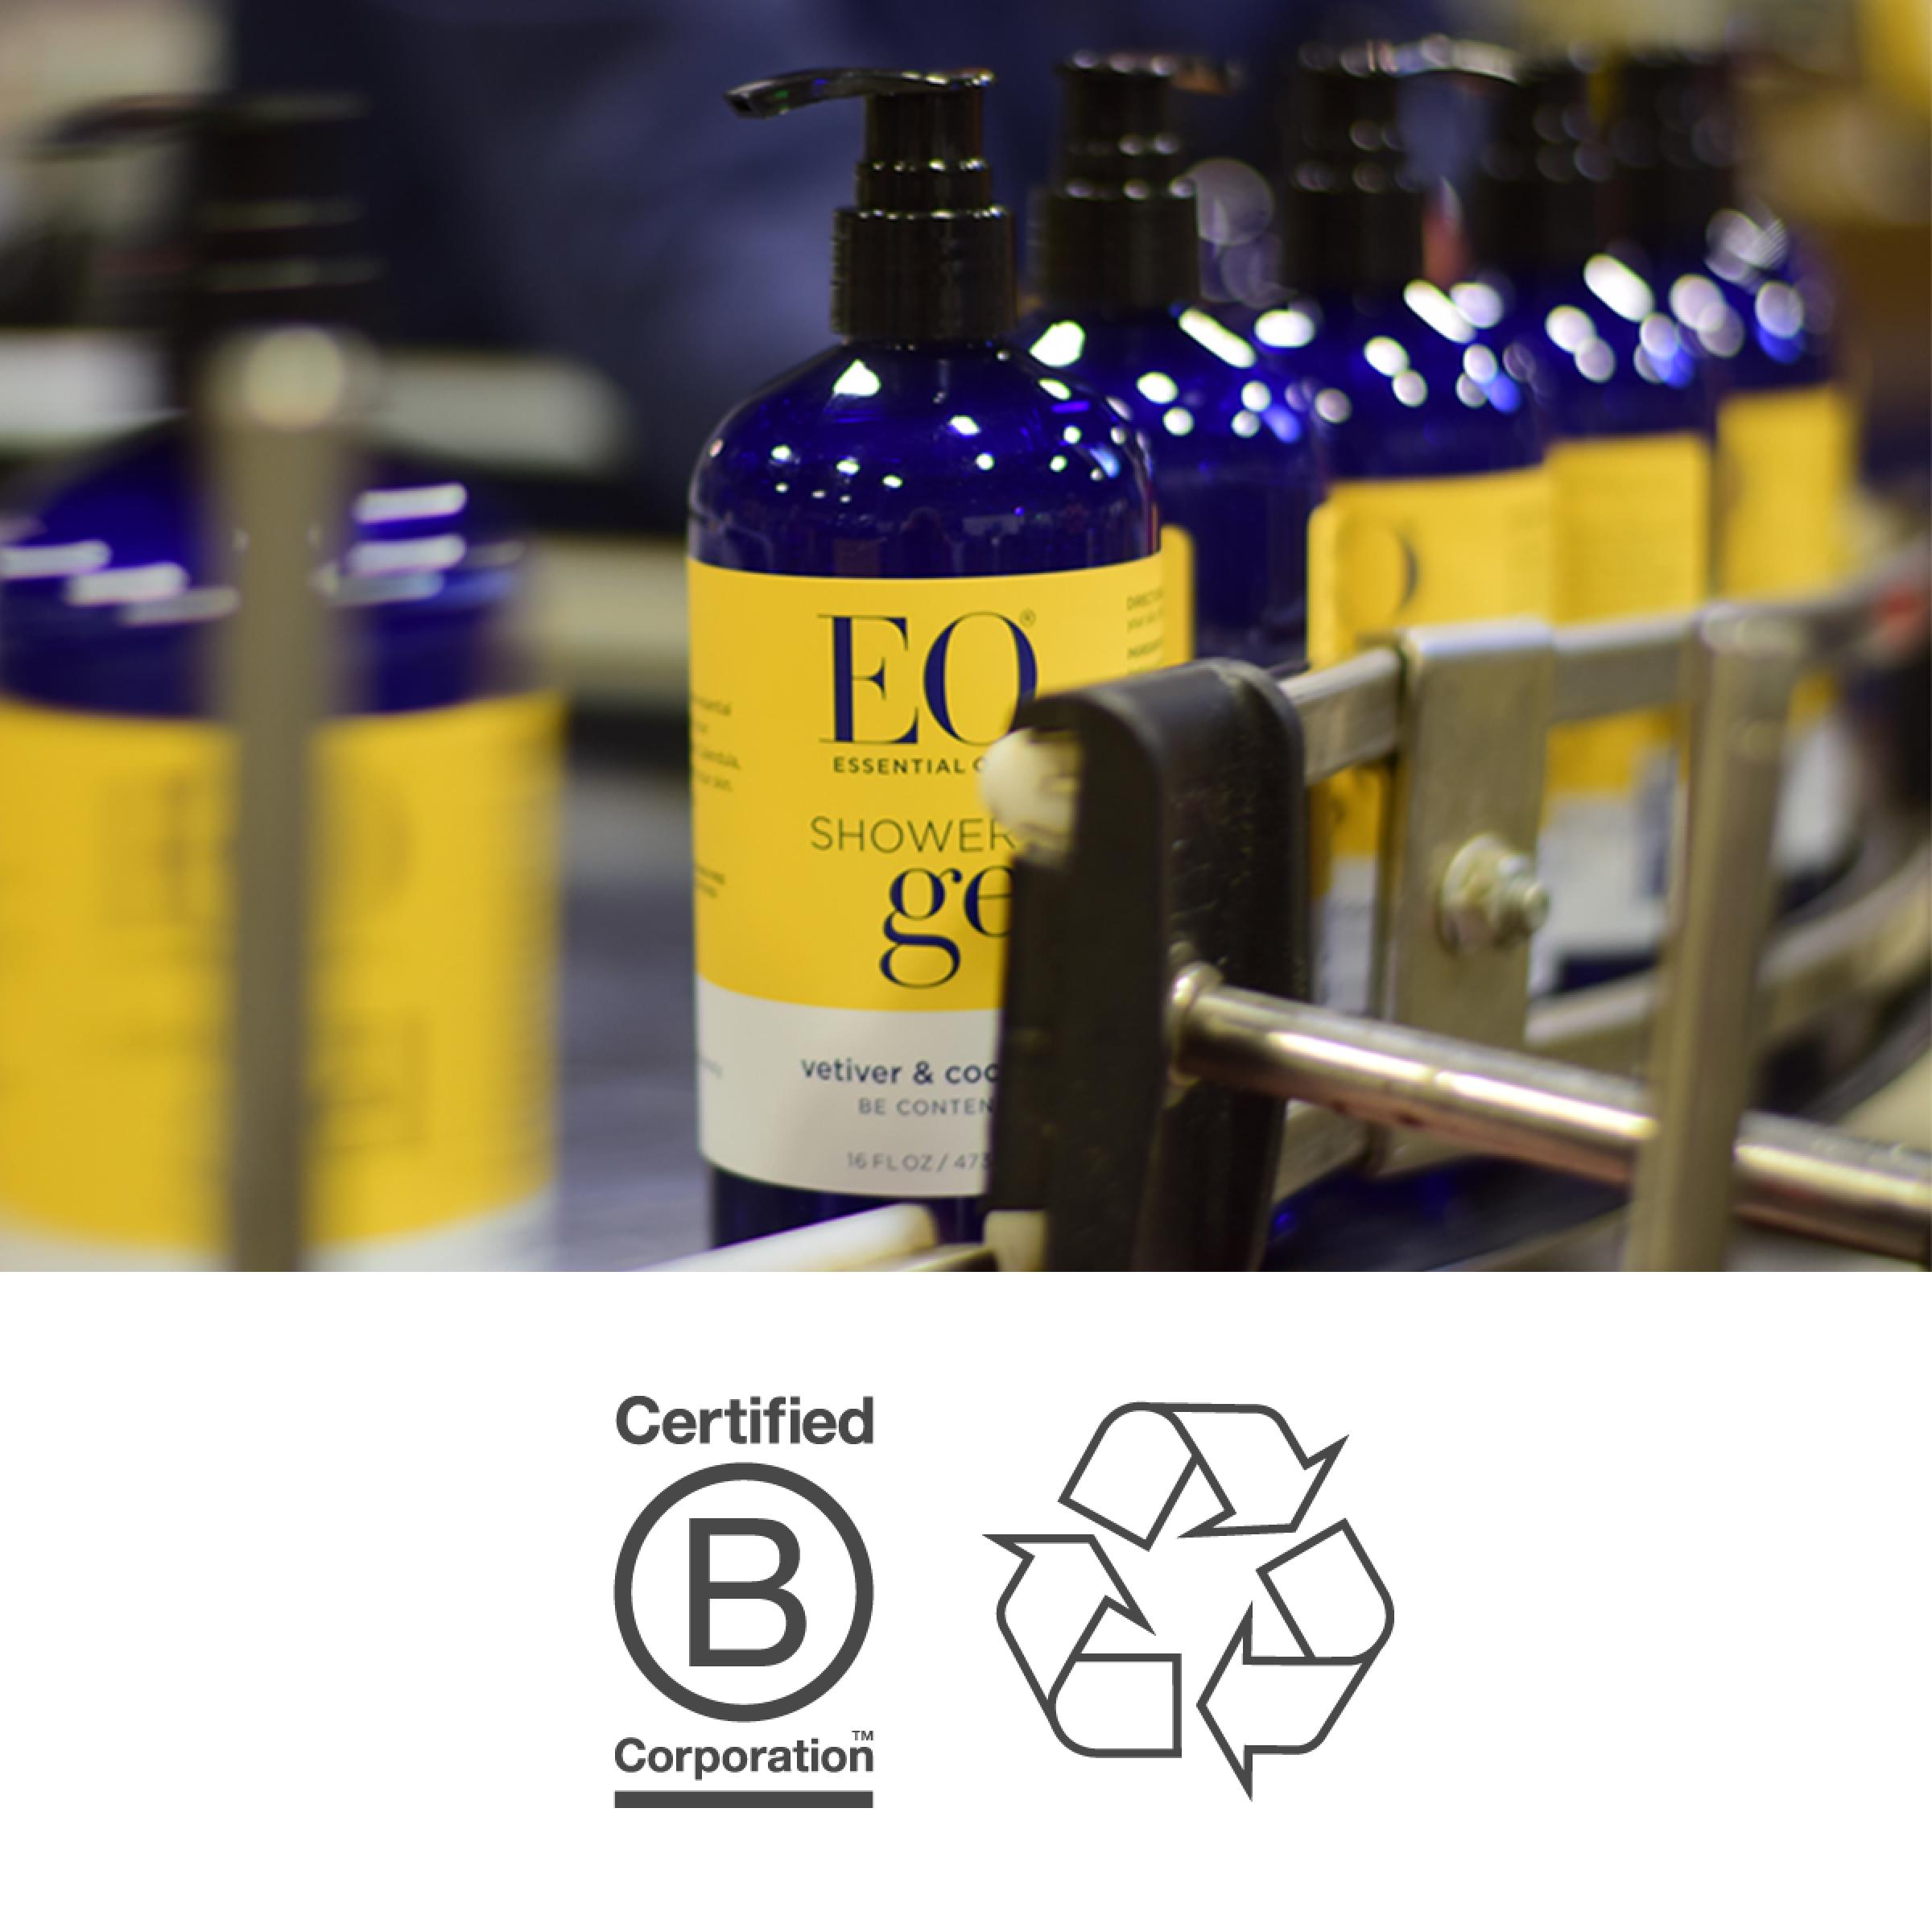 EO Products(イーオー プロダクツ)の経営理念